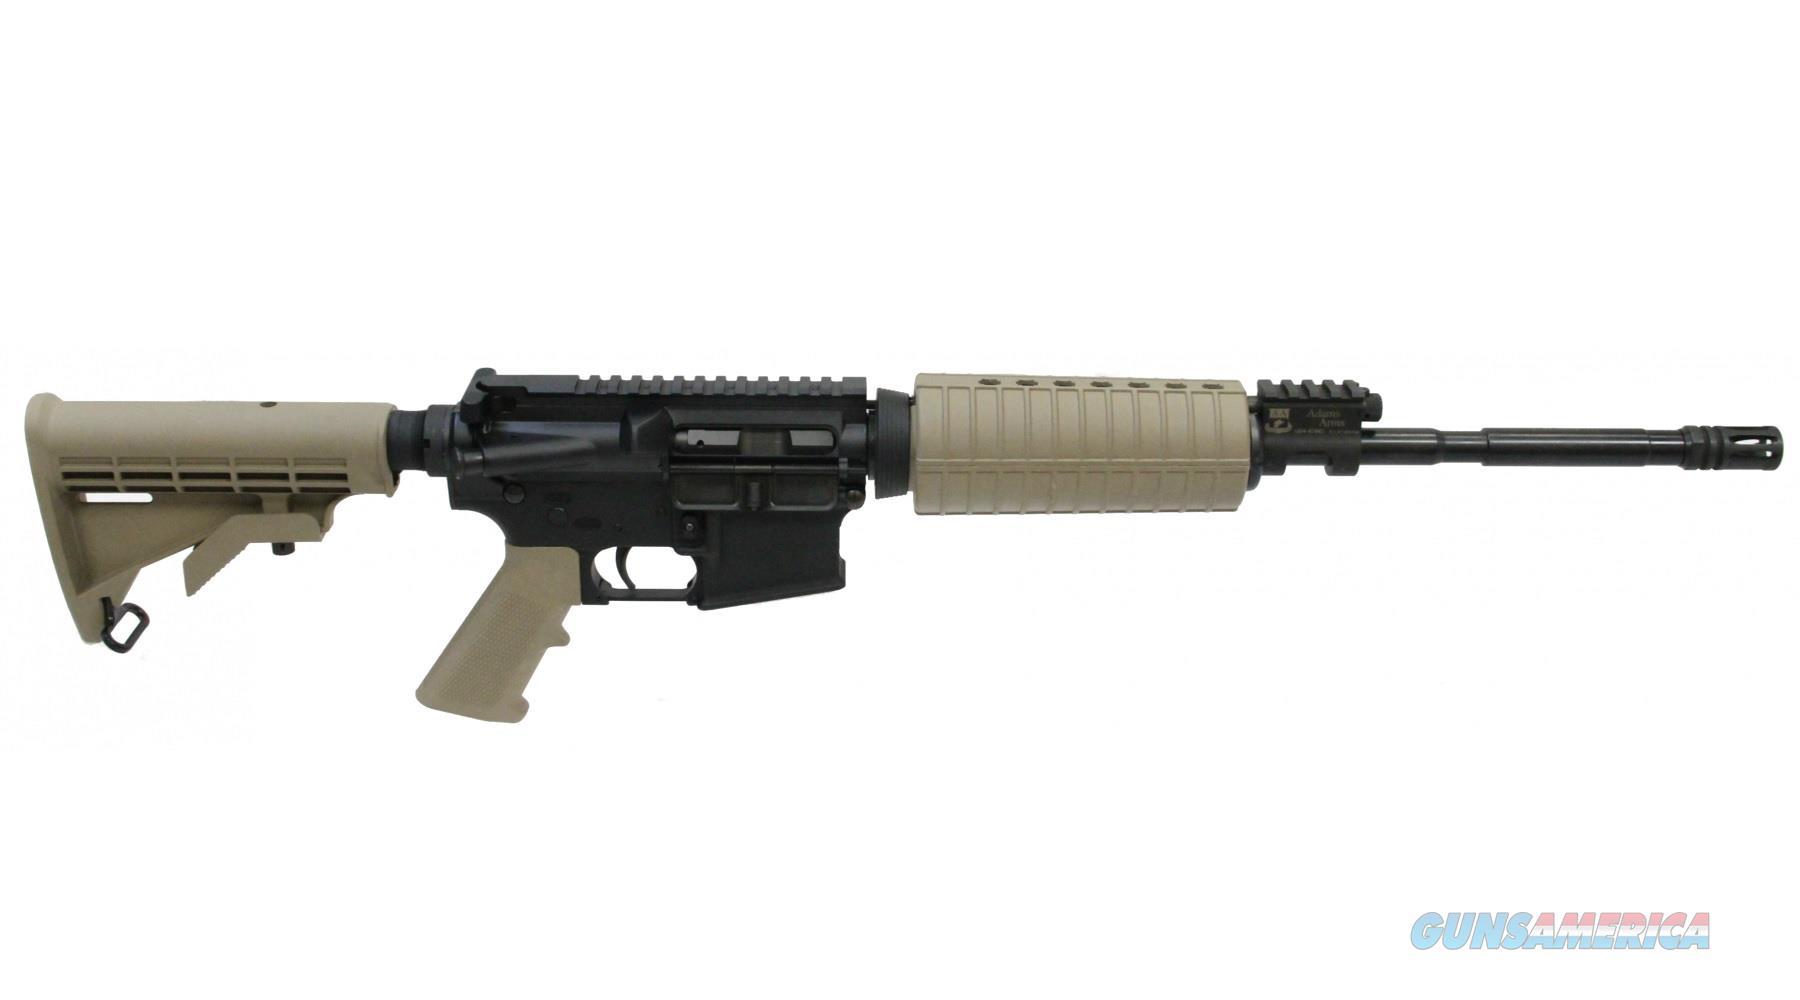 "ADAMS ARMS AGENCY BASE PISTON AR-15 AR15 16"" FDE SKU: FGAA-00225-R  Guns > Rifles > AR-15 Rifles - Small Manufacturers > Complete Rifle"